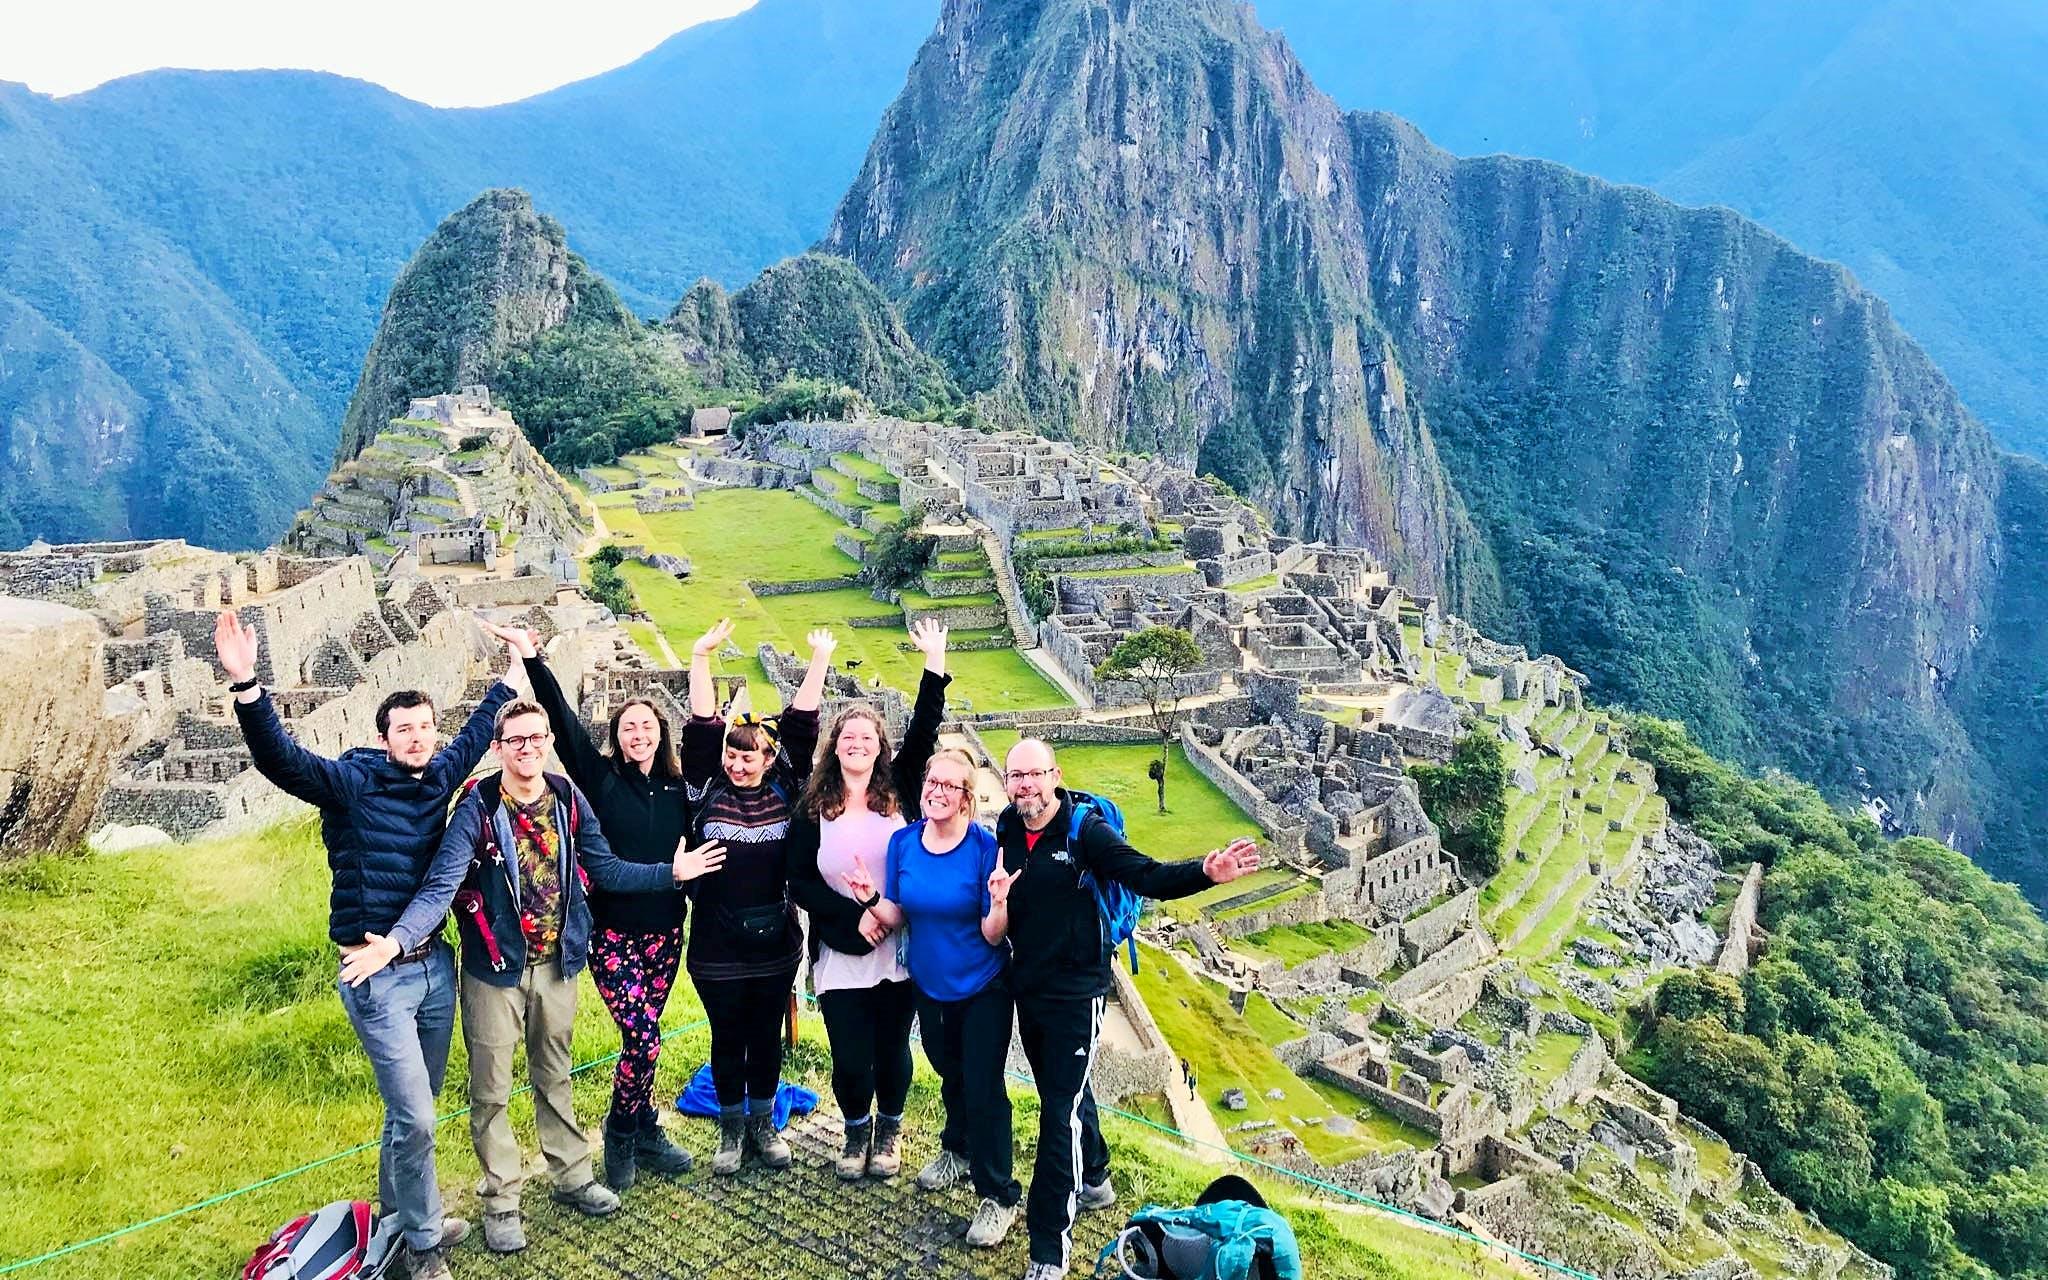 Short Inca Trail hike to Machu Picchu - 2 days